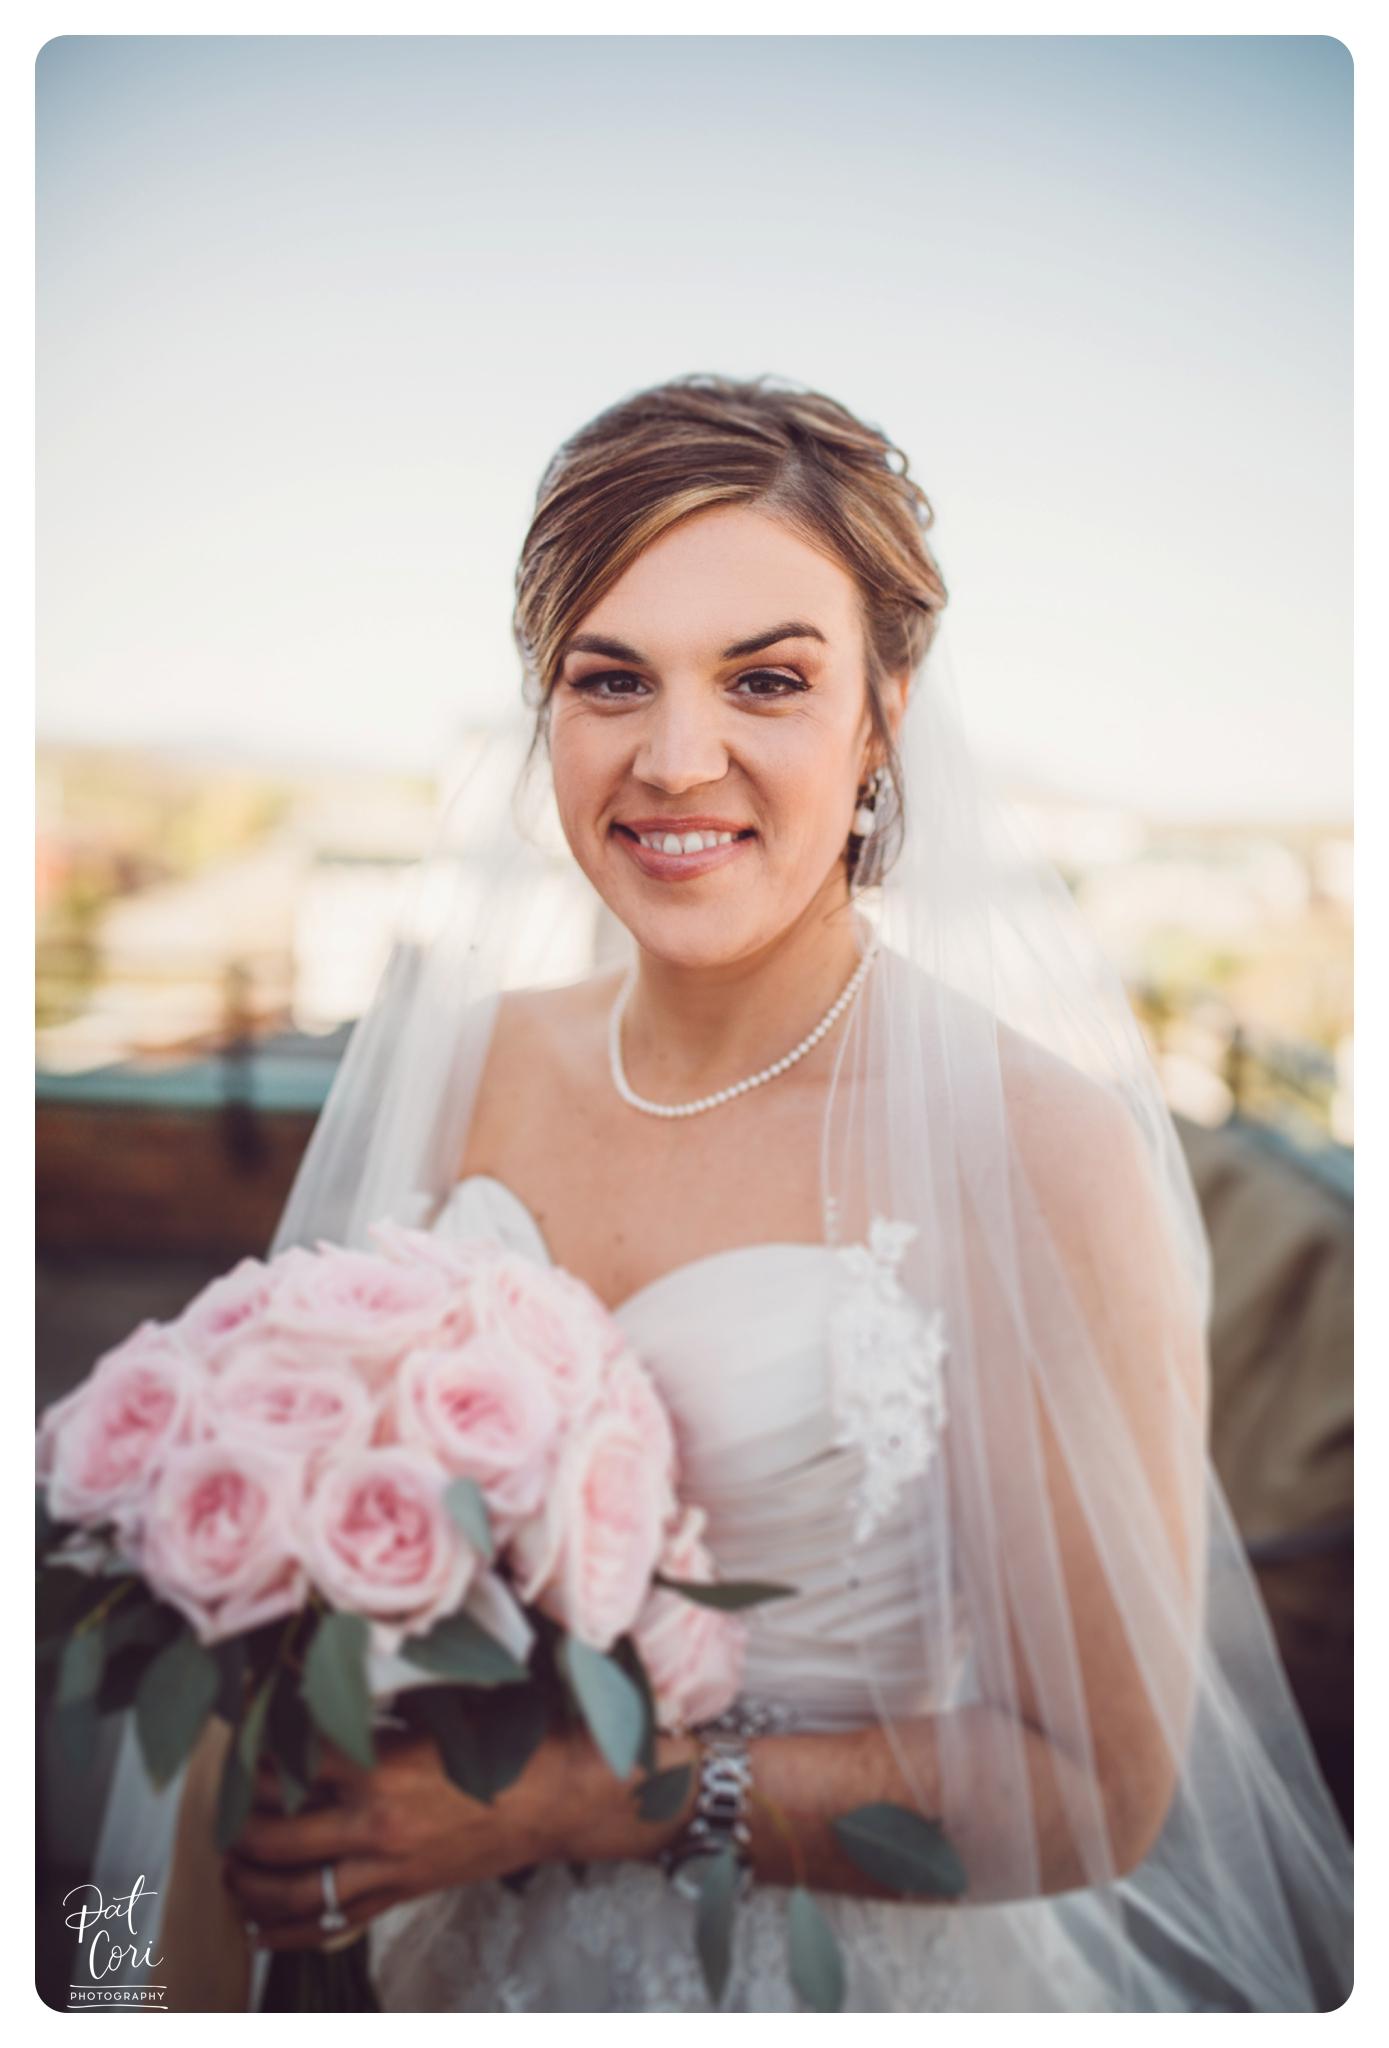 Center-in-the-Square-_-Weddings-Wedding-Photographer-Virginia-052.jpg